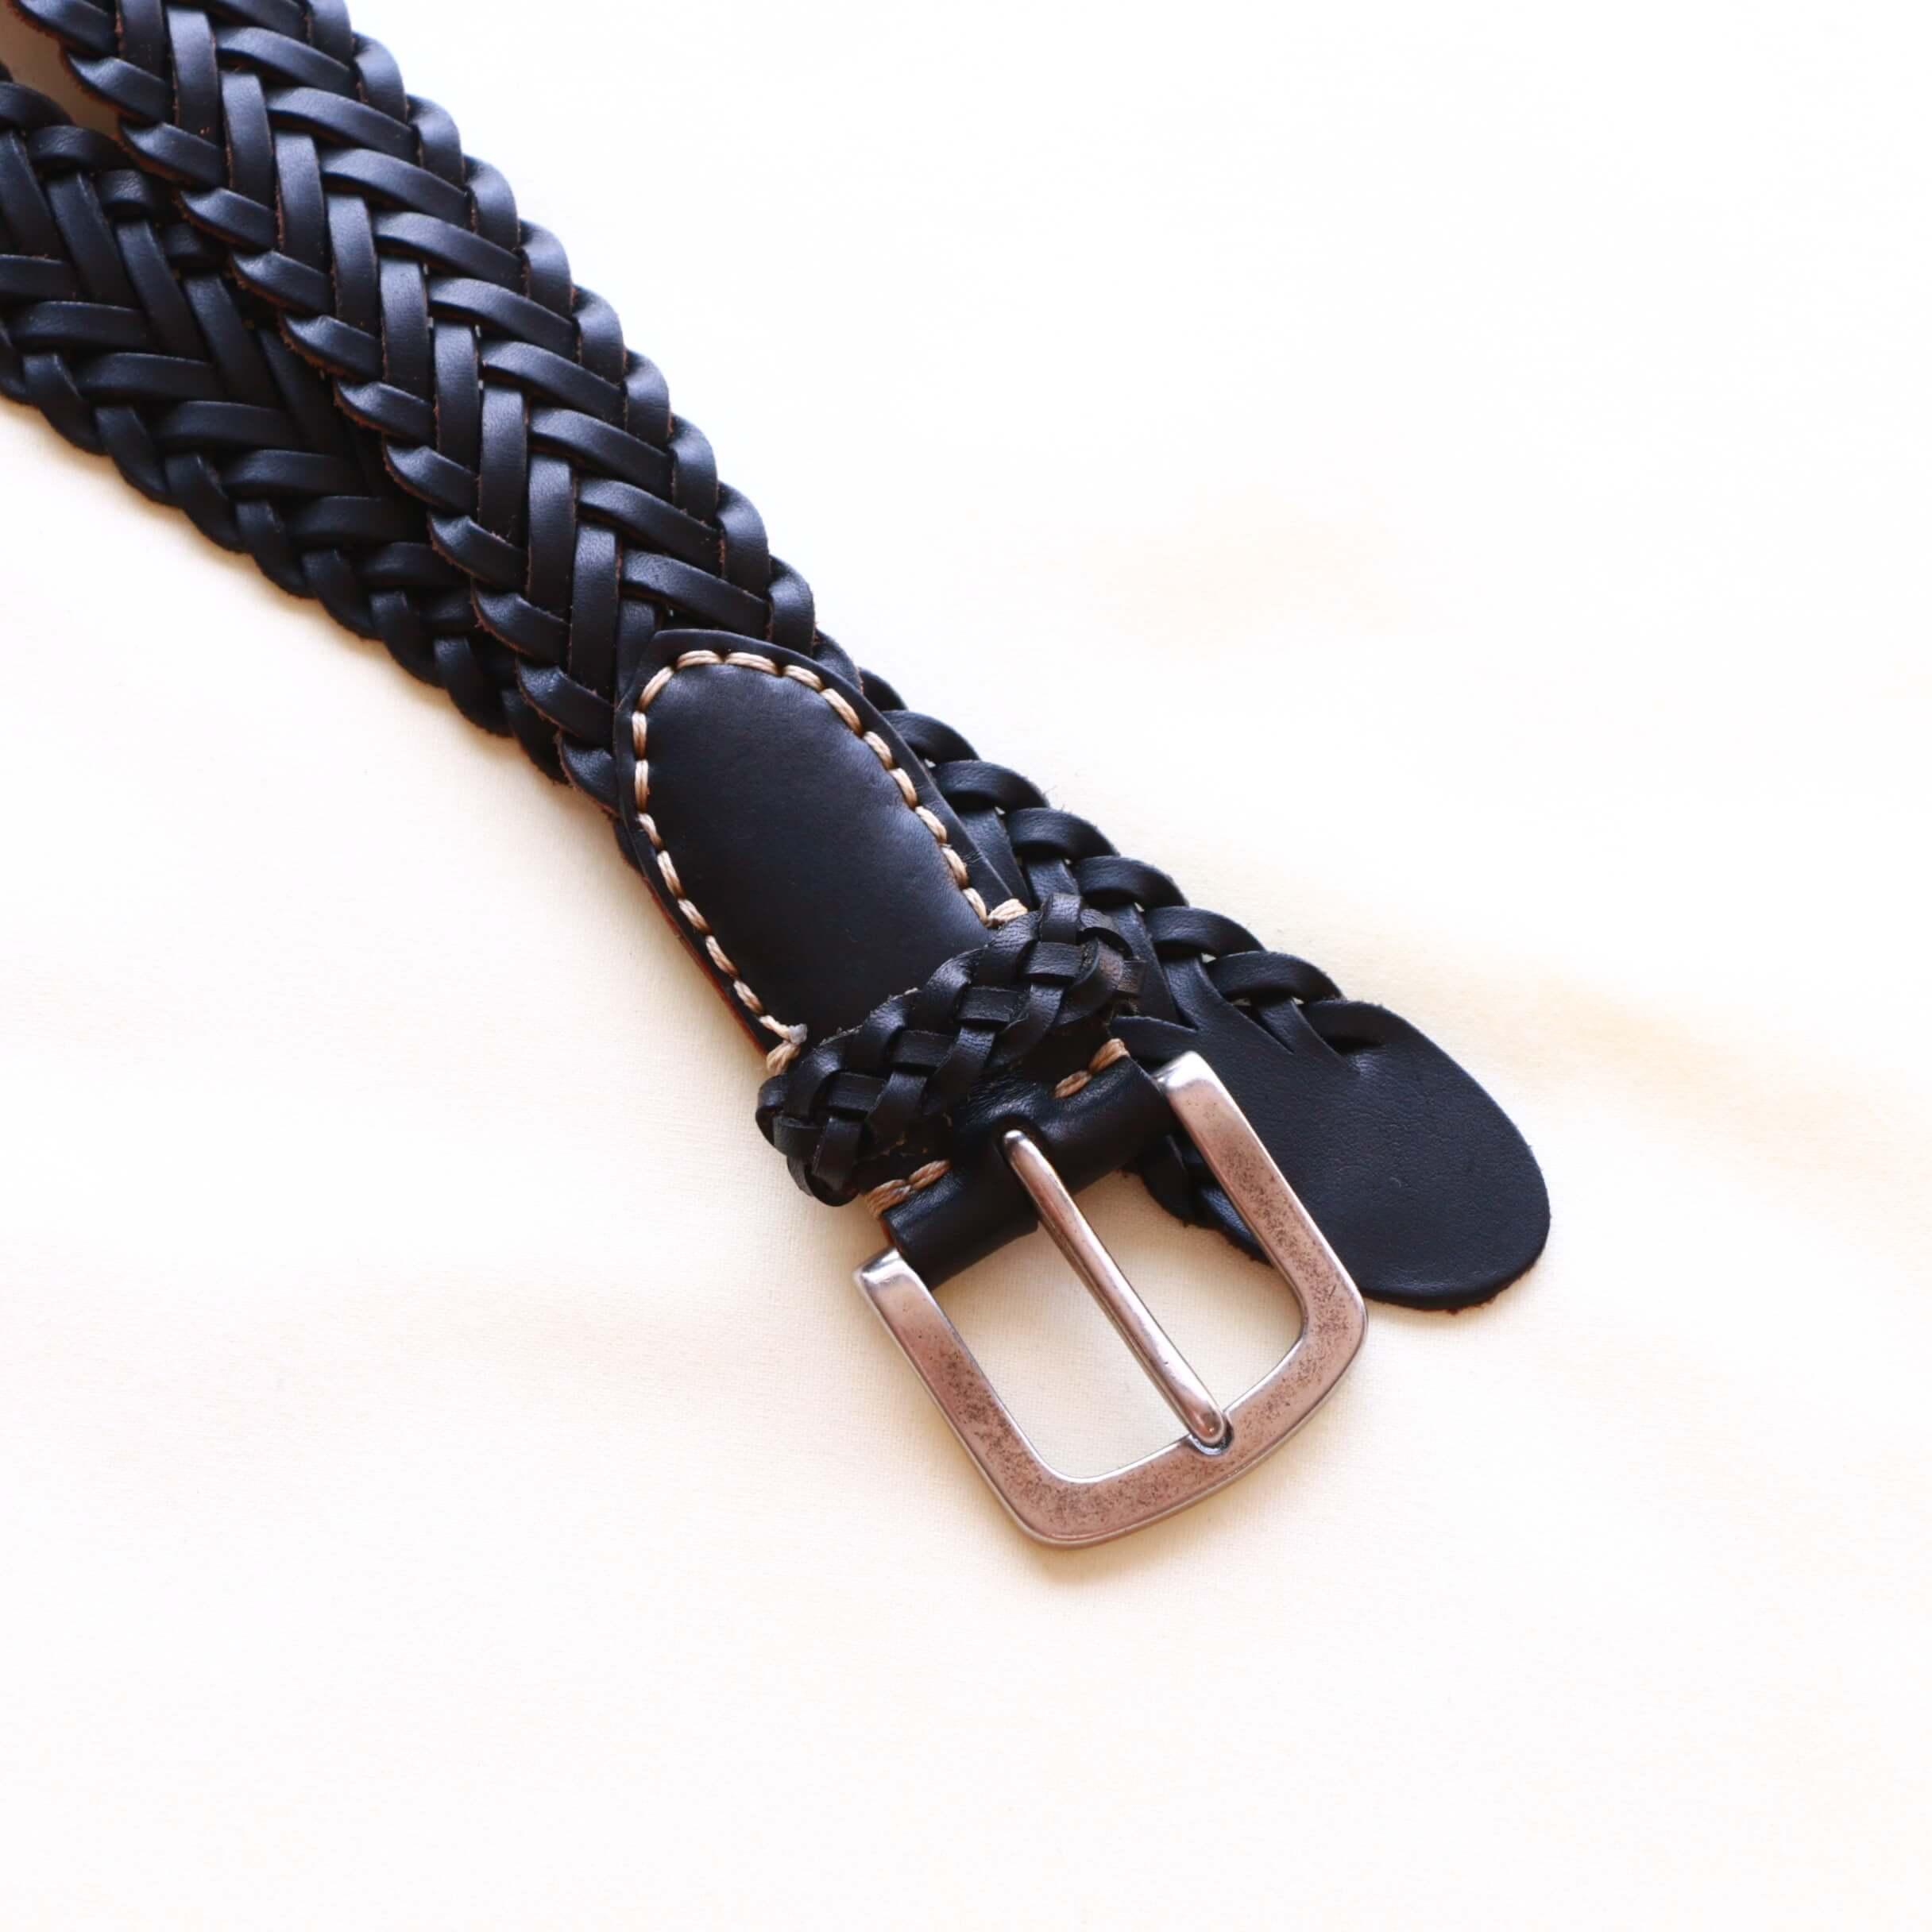 Vintage Works ヴィンテージワークス Leather belt レザーメッシュベルト DH5708